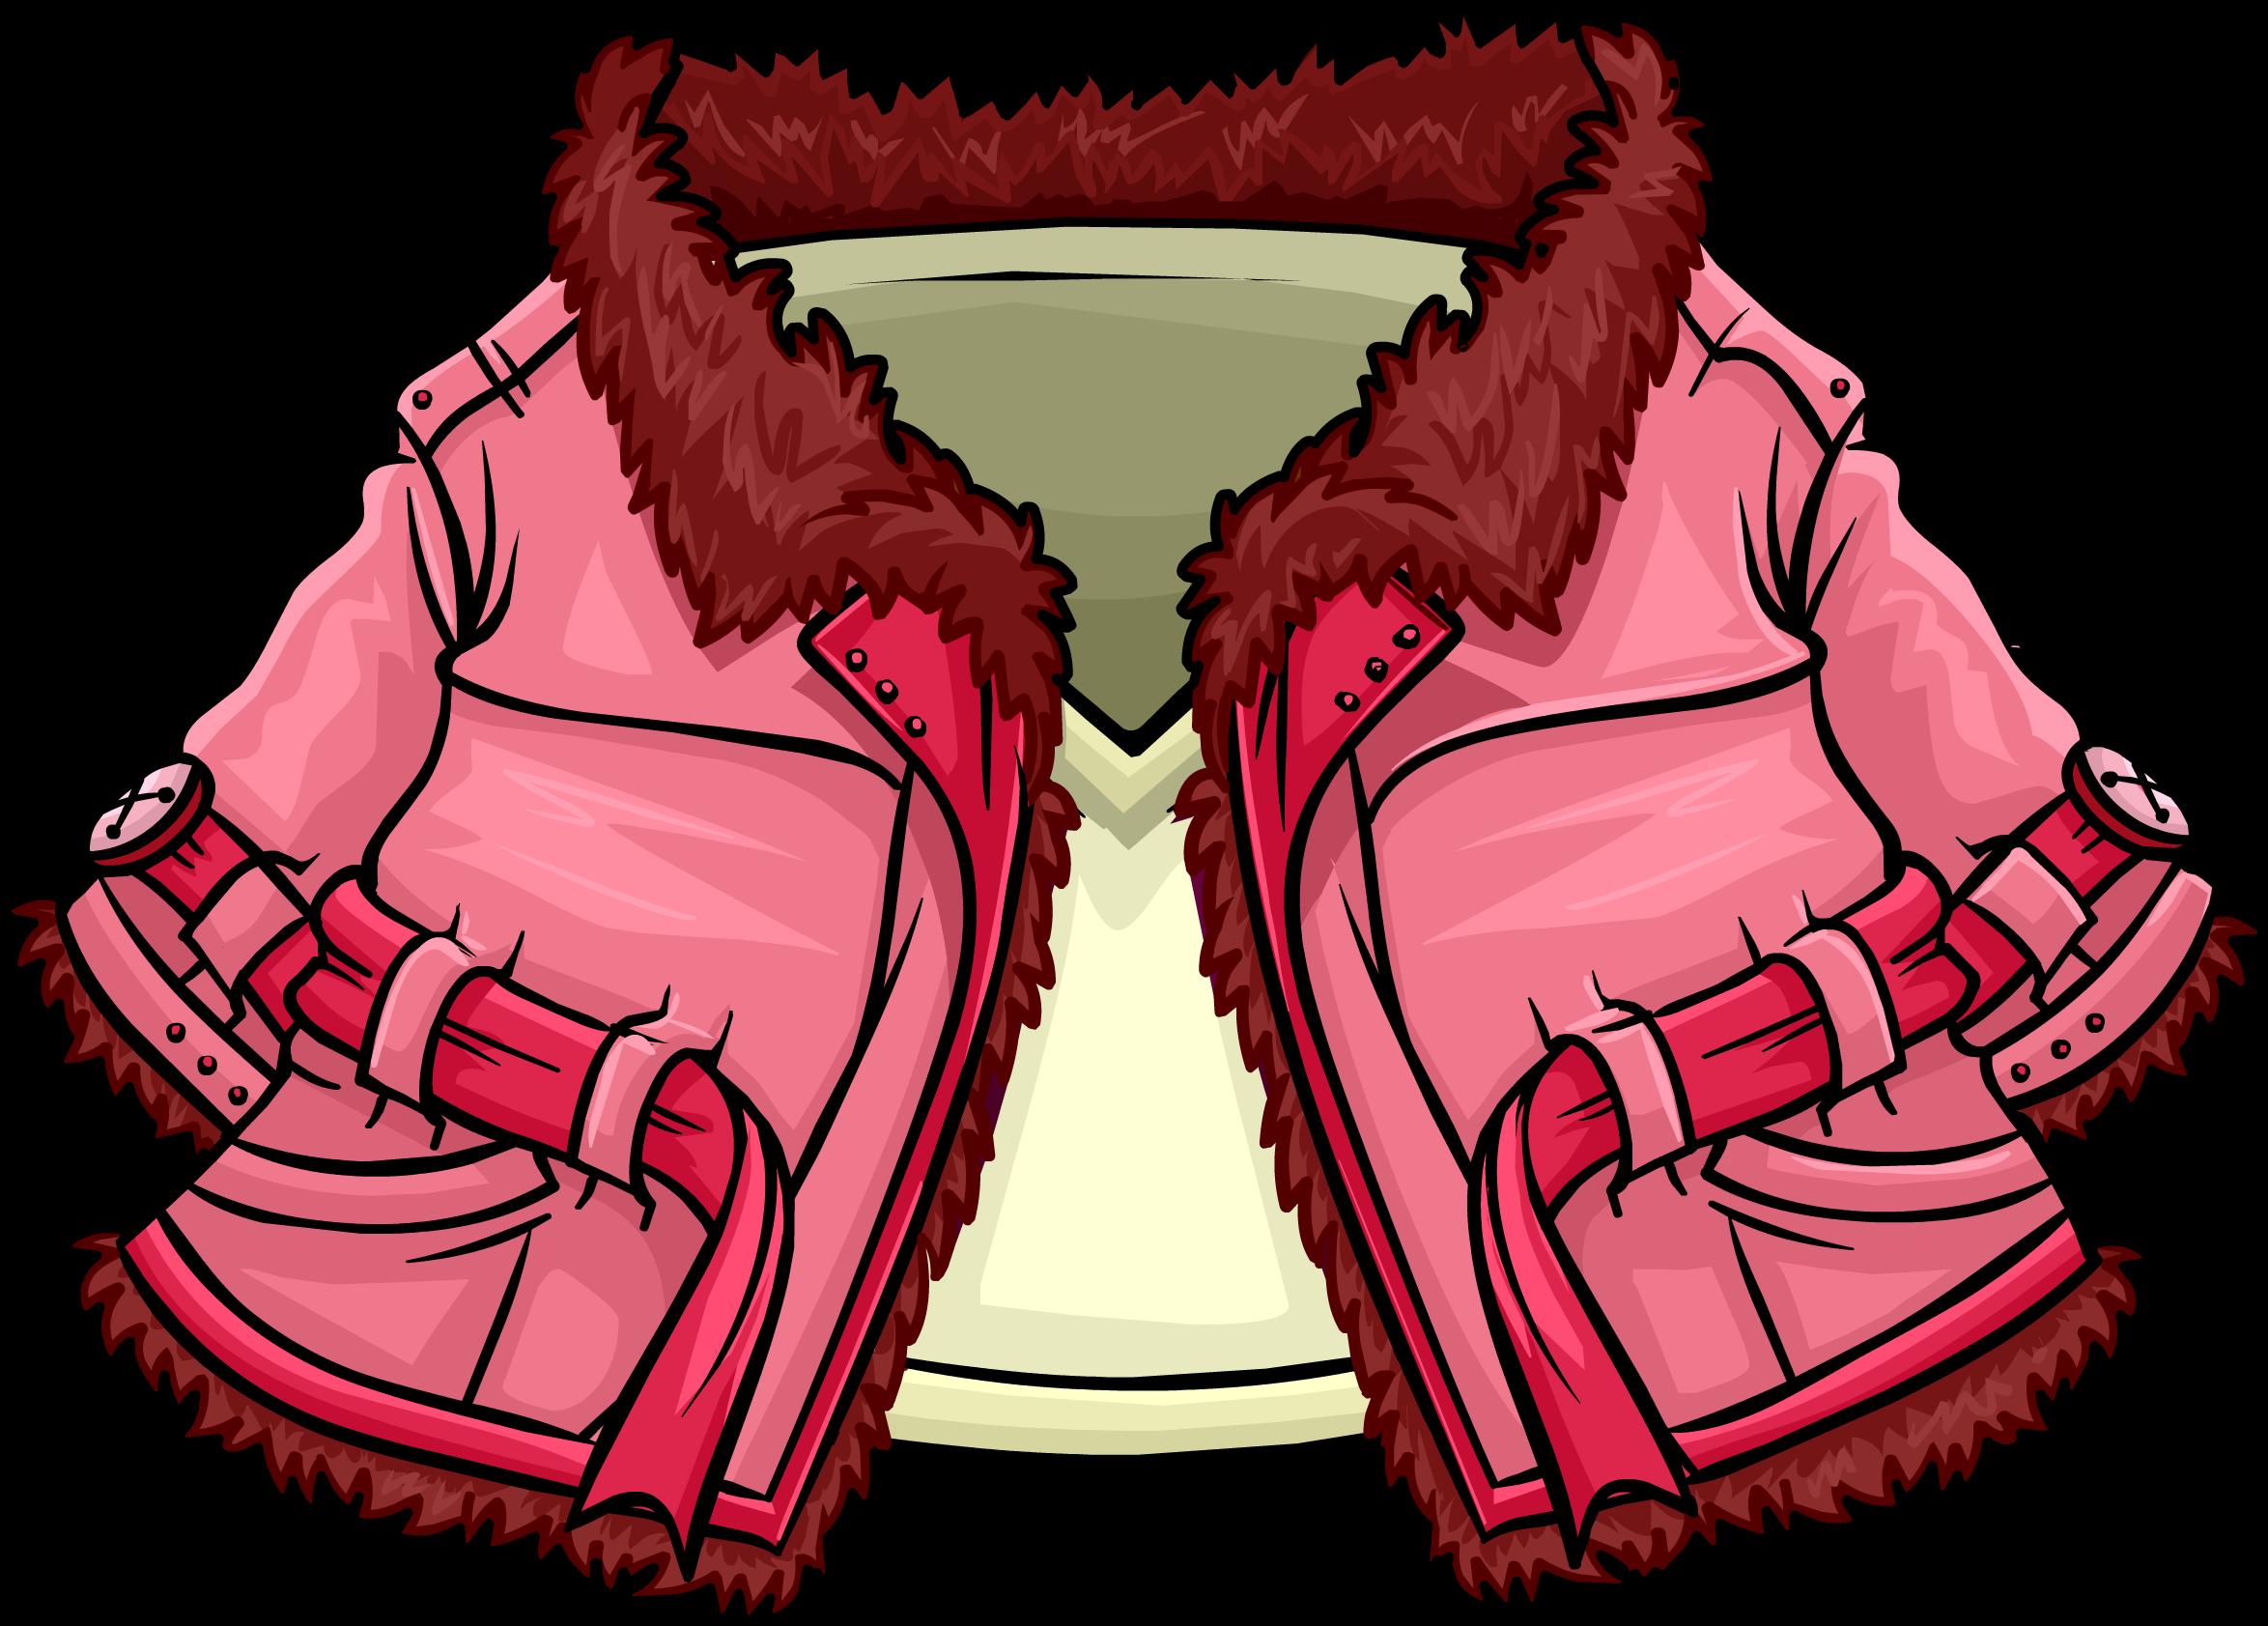 jacket clipart winterclothes